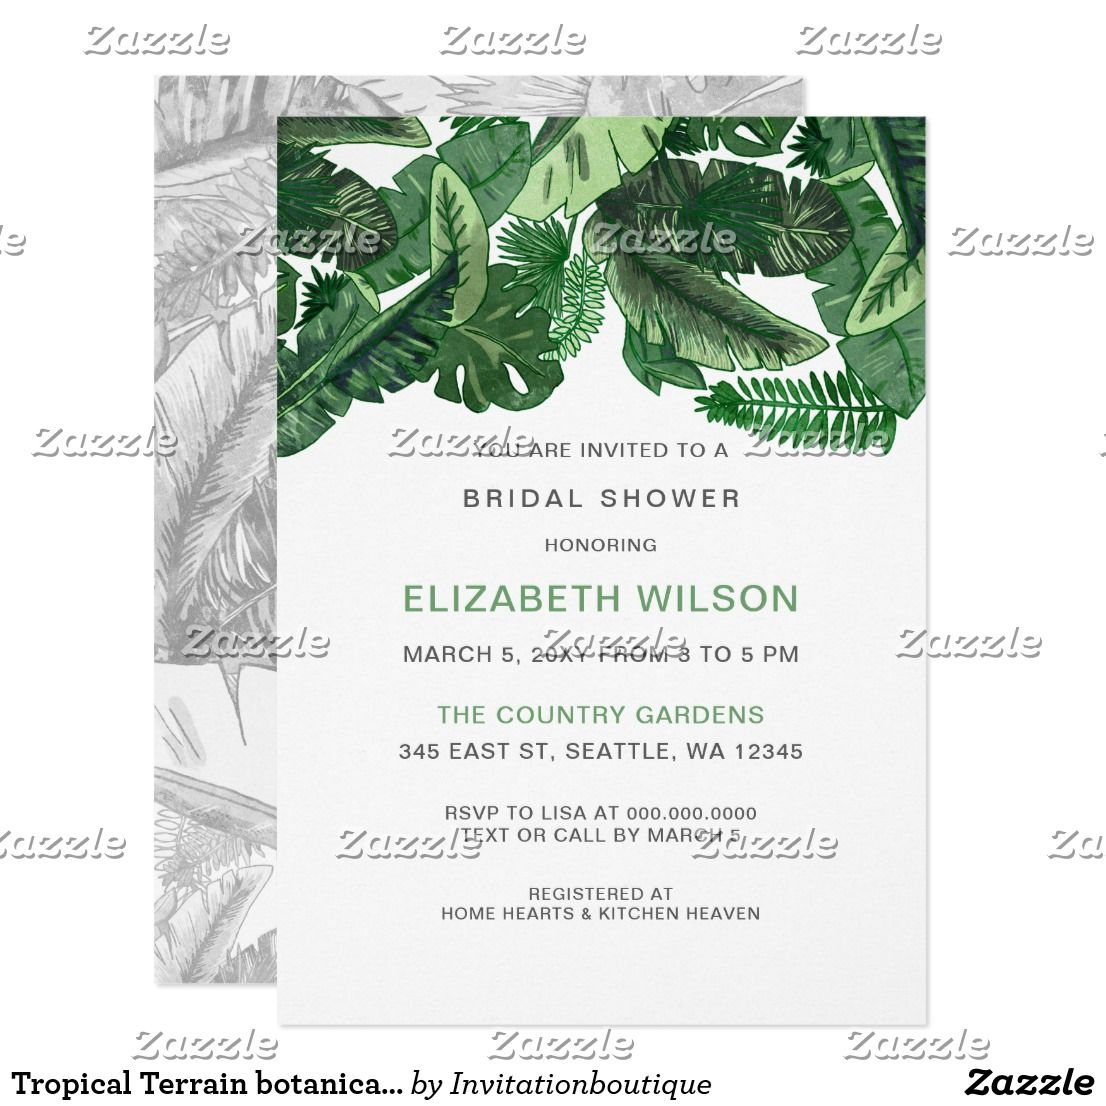 Wedding decorations traditional october 2018 Tropical Terrain botanical Bridal Shower Invitation in   Bridal